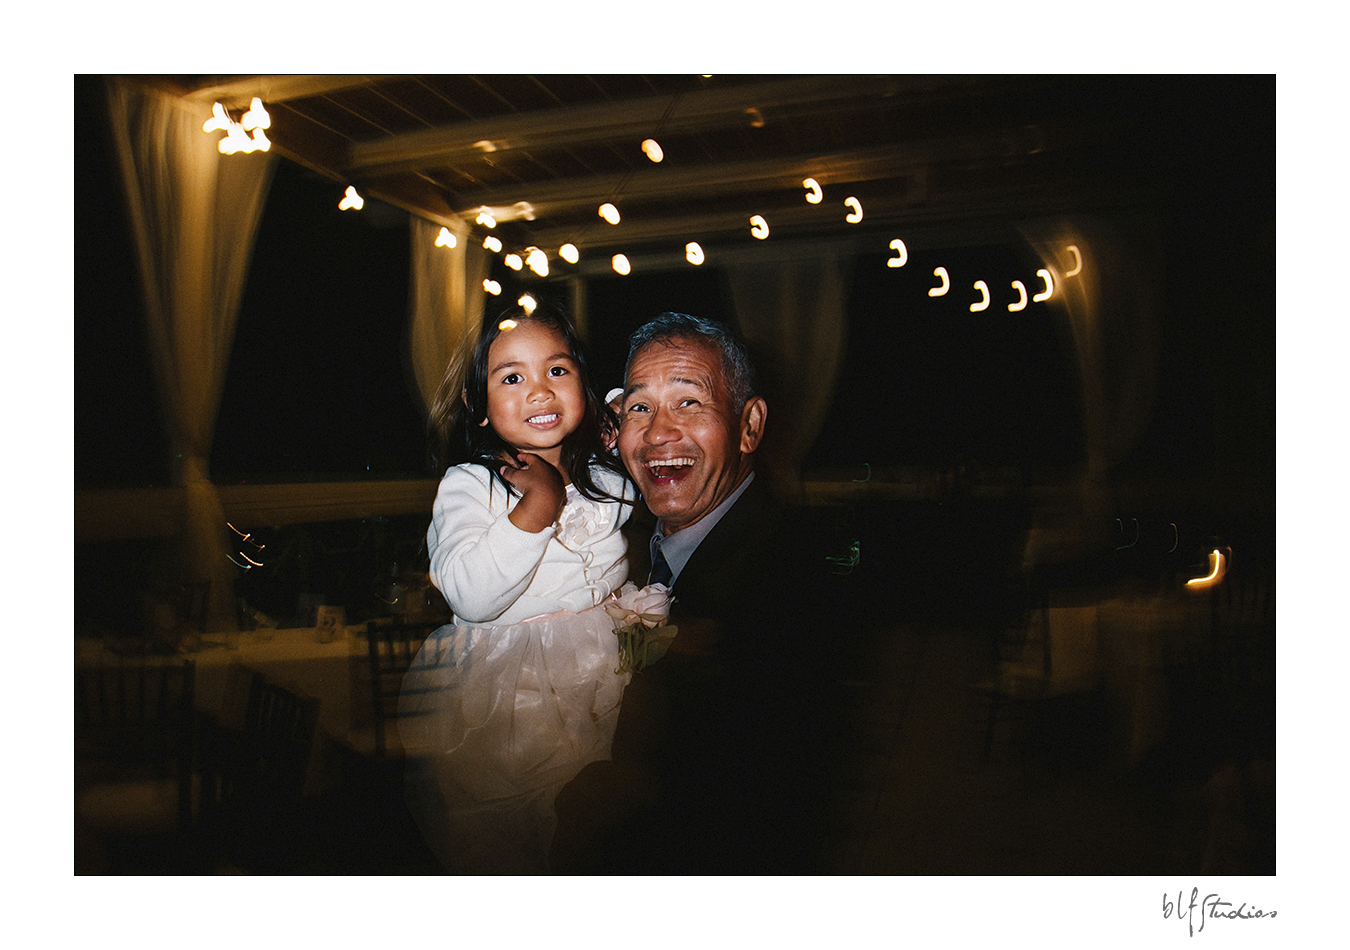 0044-blfstudios-wedding-photographer-daniel-danielle-atlanta.jpg